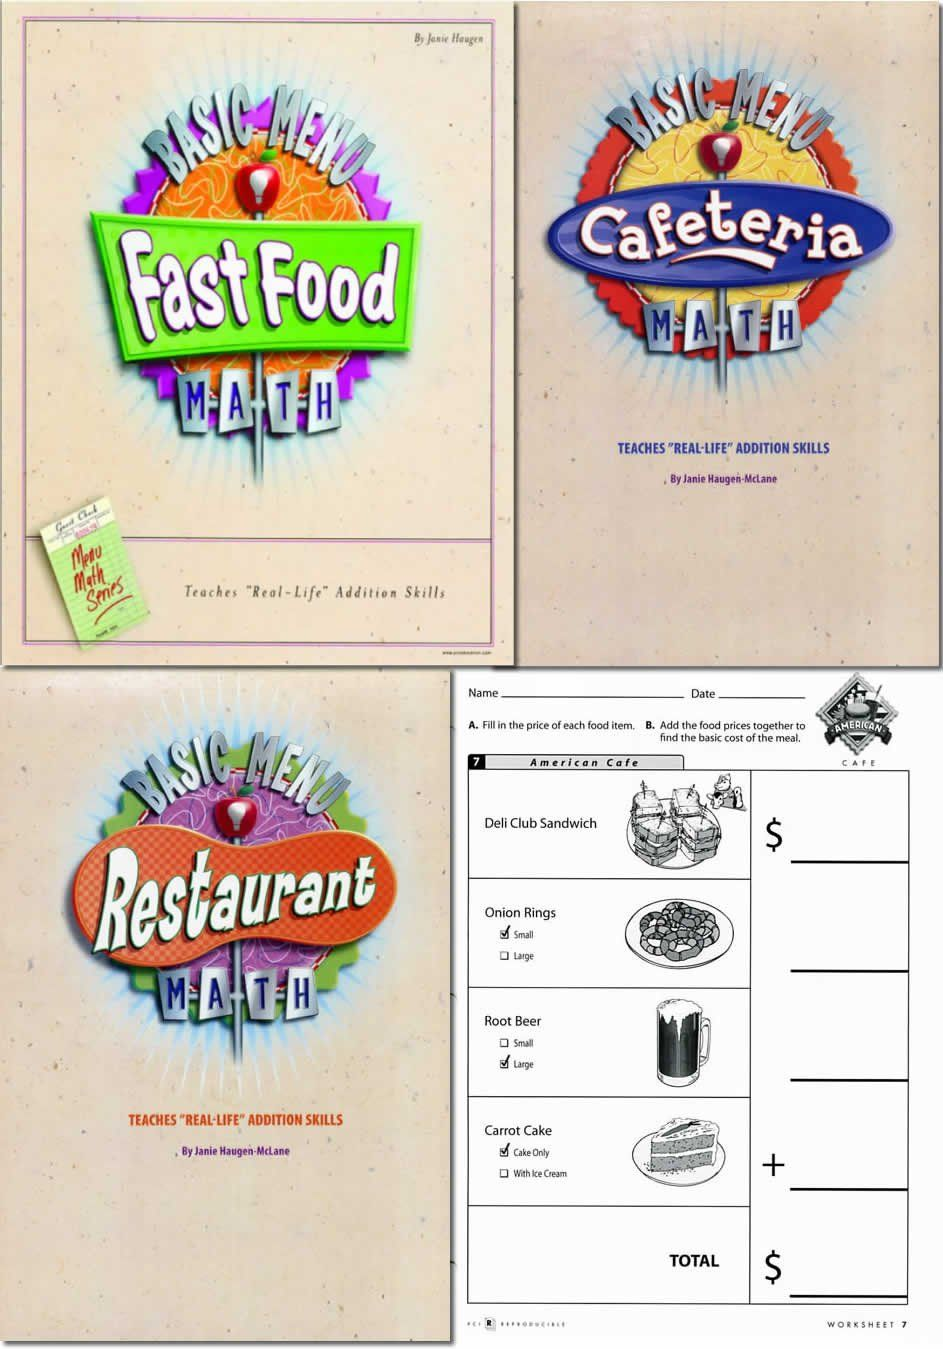 Restaurant Menu Math Worksheets Basic Menu Math In 2020 Kids Math Worksheets Math Worksheets Kindergarten Math Worksheets [ 1349 x 943 Pixel ]